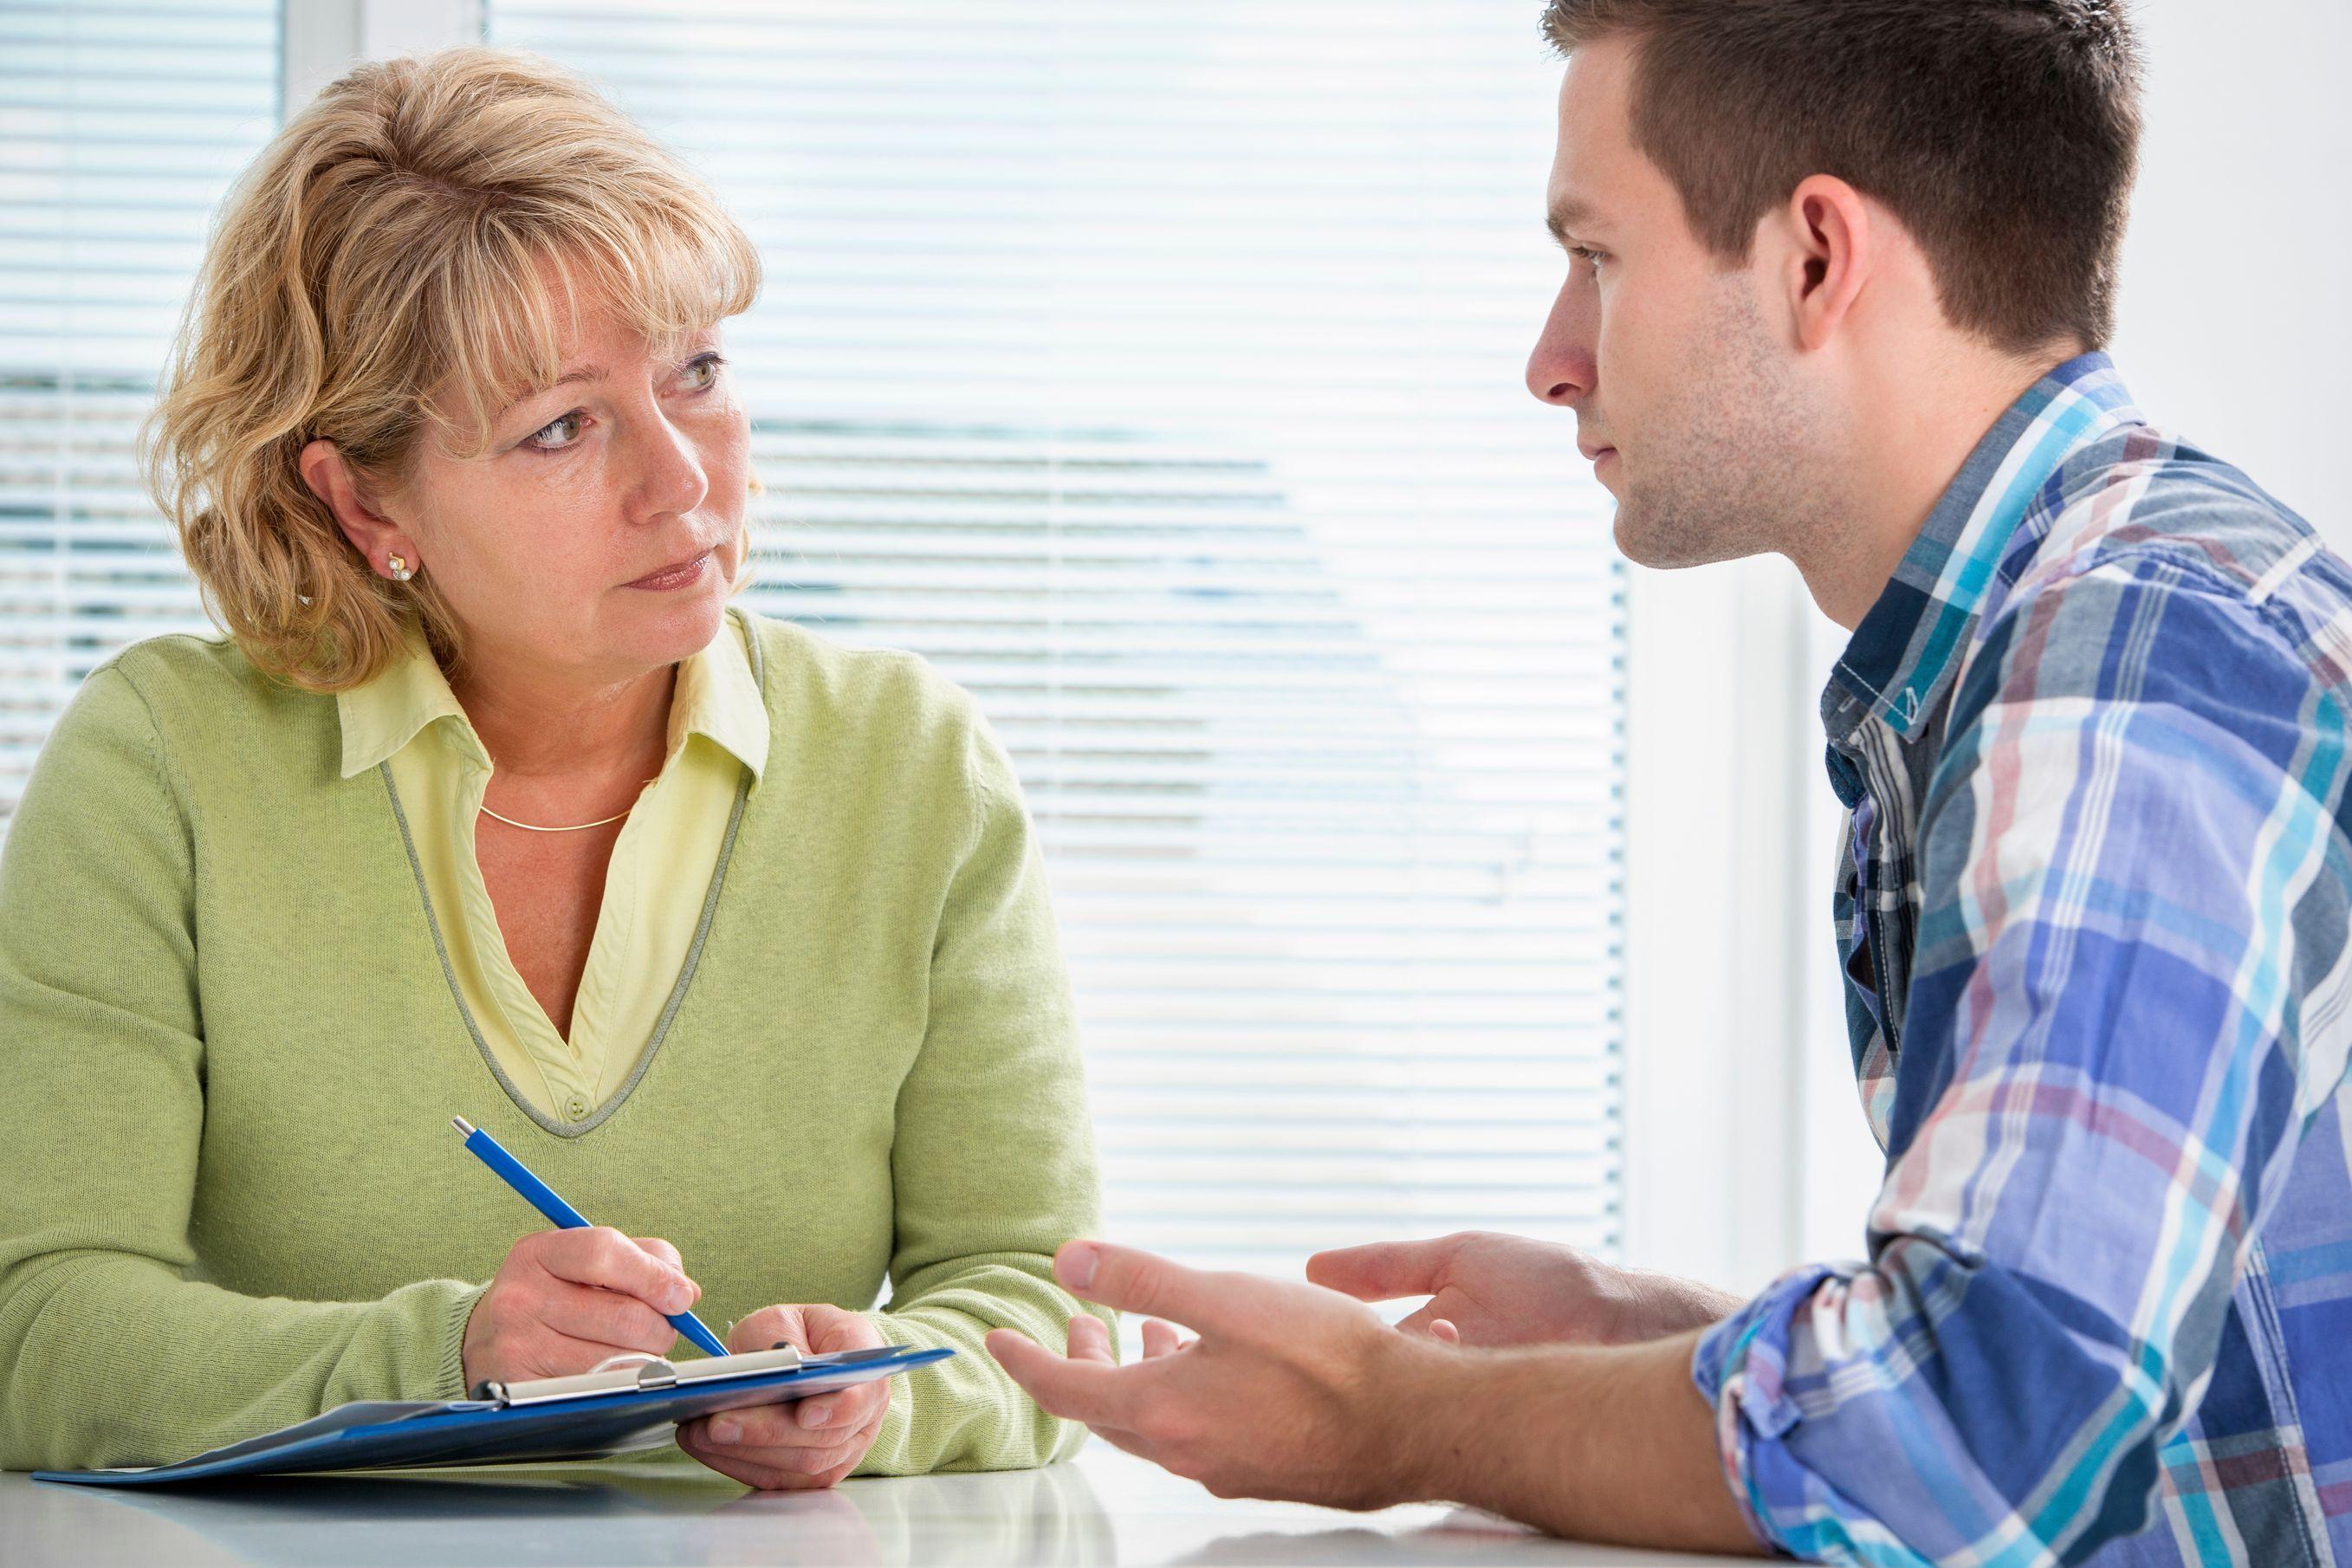 enterobiasis define human papillomavirus (hpv) cervical screening and cervical cancer